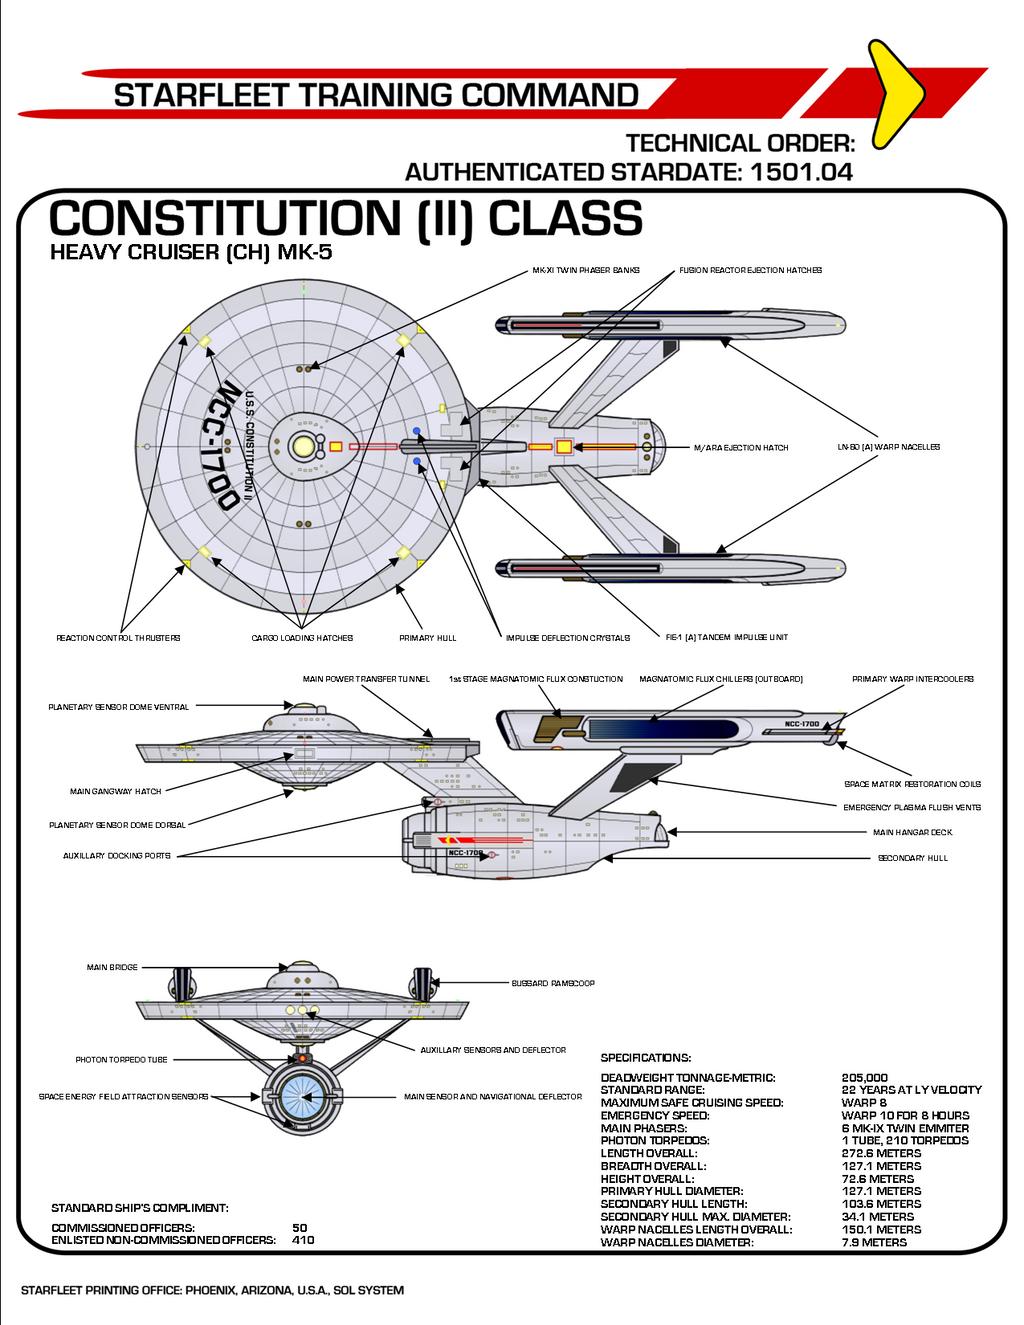 Star Trek Phase II Constitution (II) Class by viperaviator